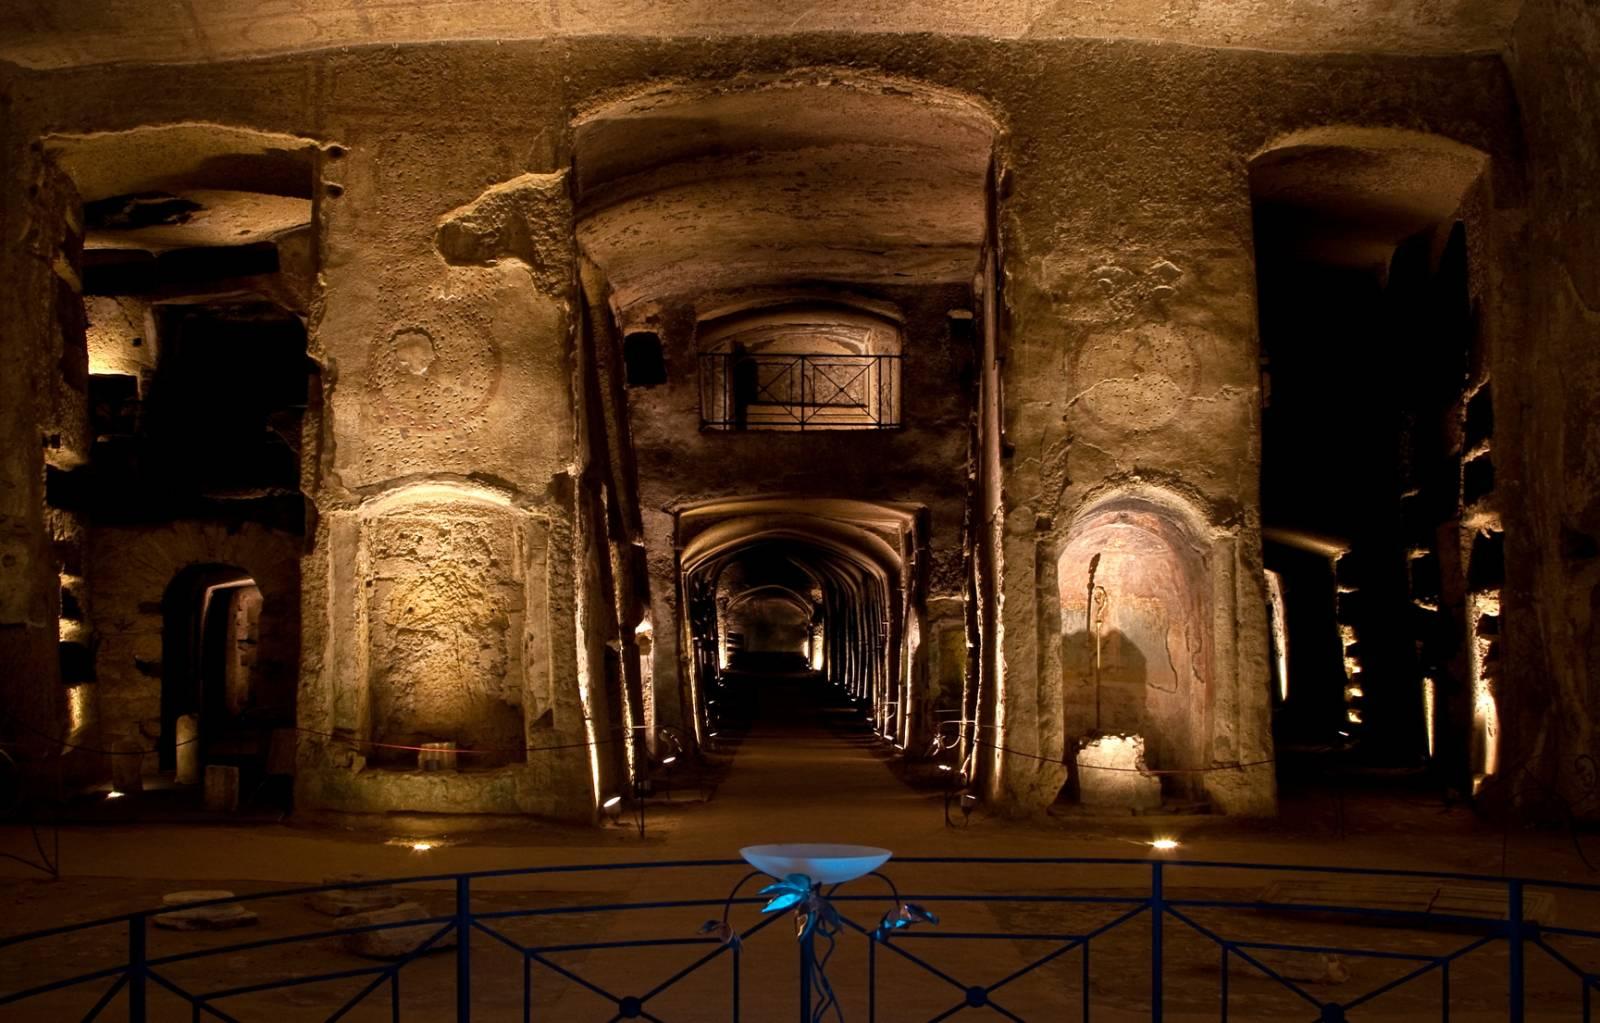 Le pi belle citt sotterranee in Italia  Sud e isole